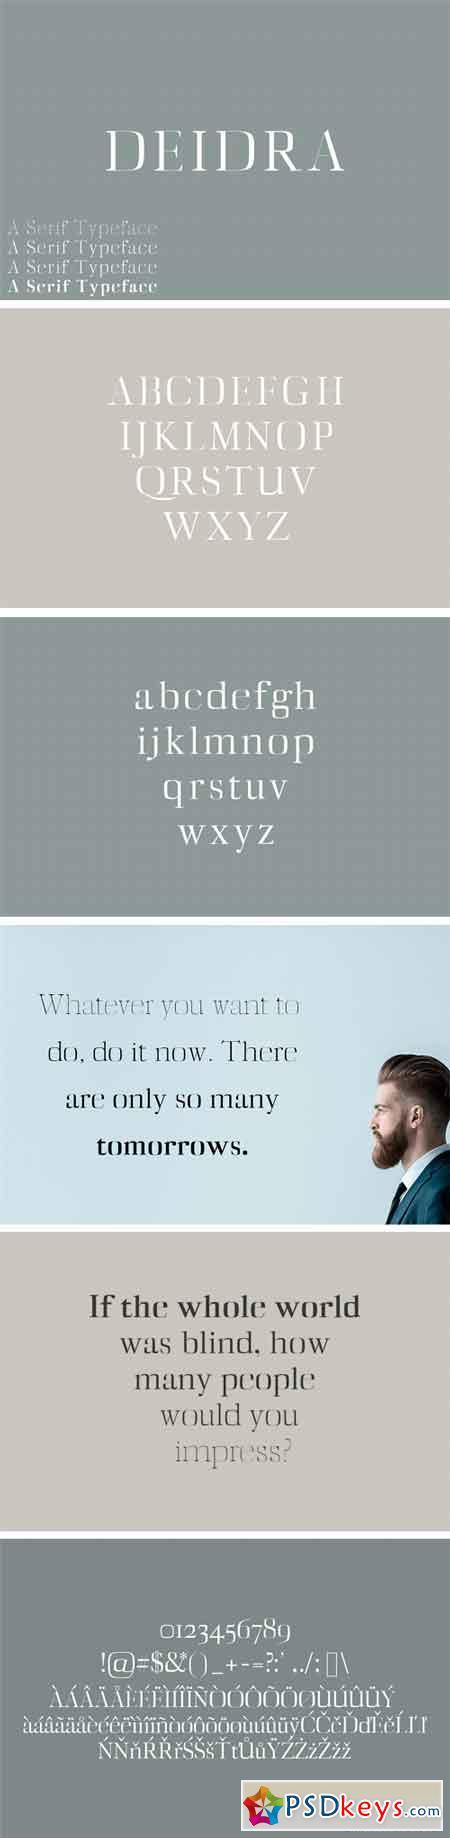 Diedra Serif Typeface 1757769